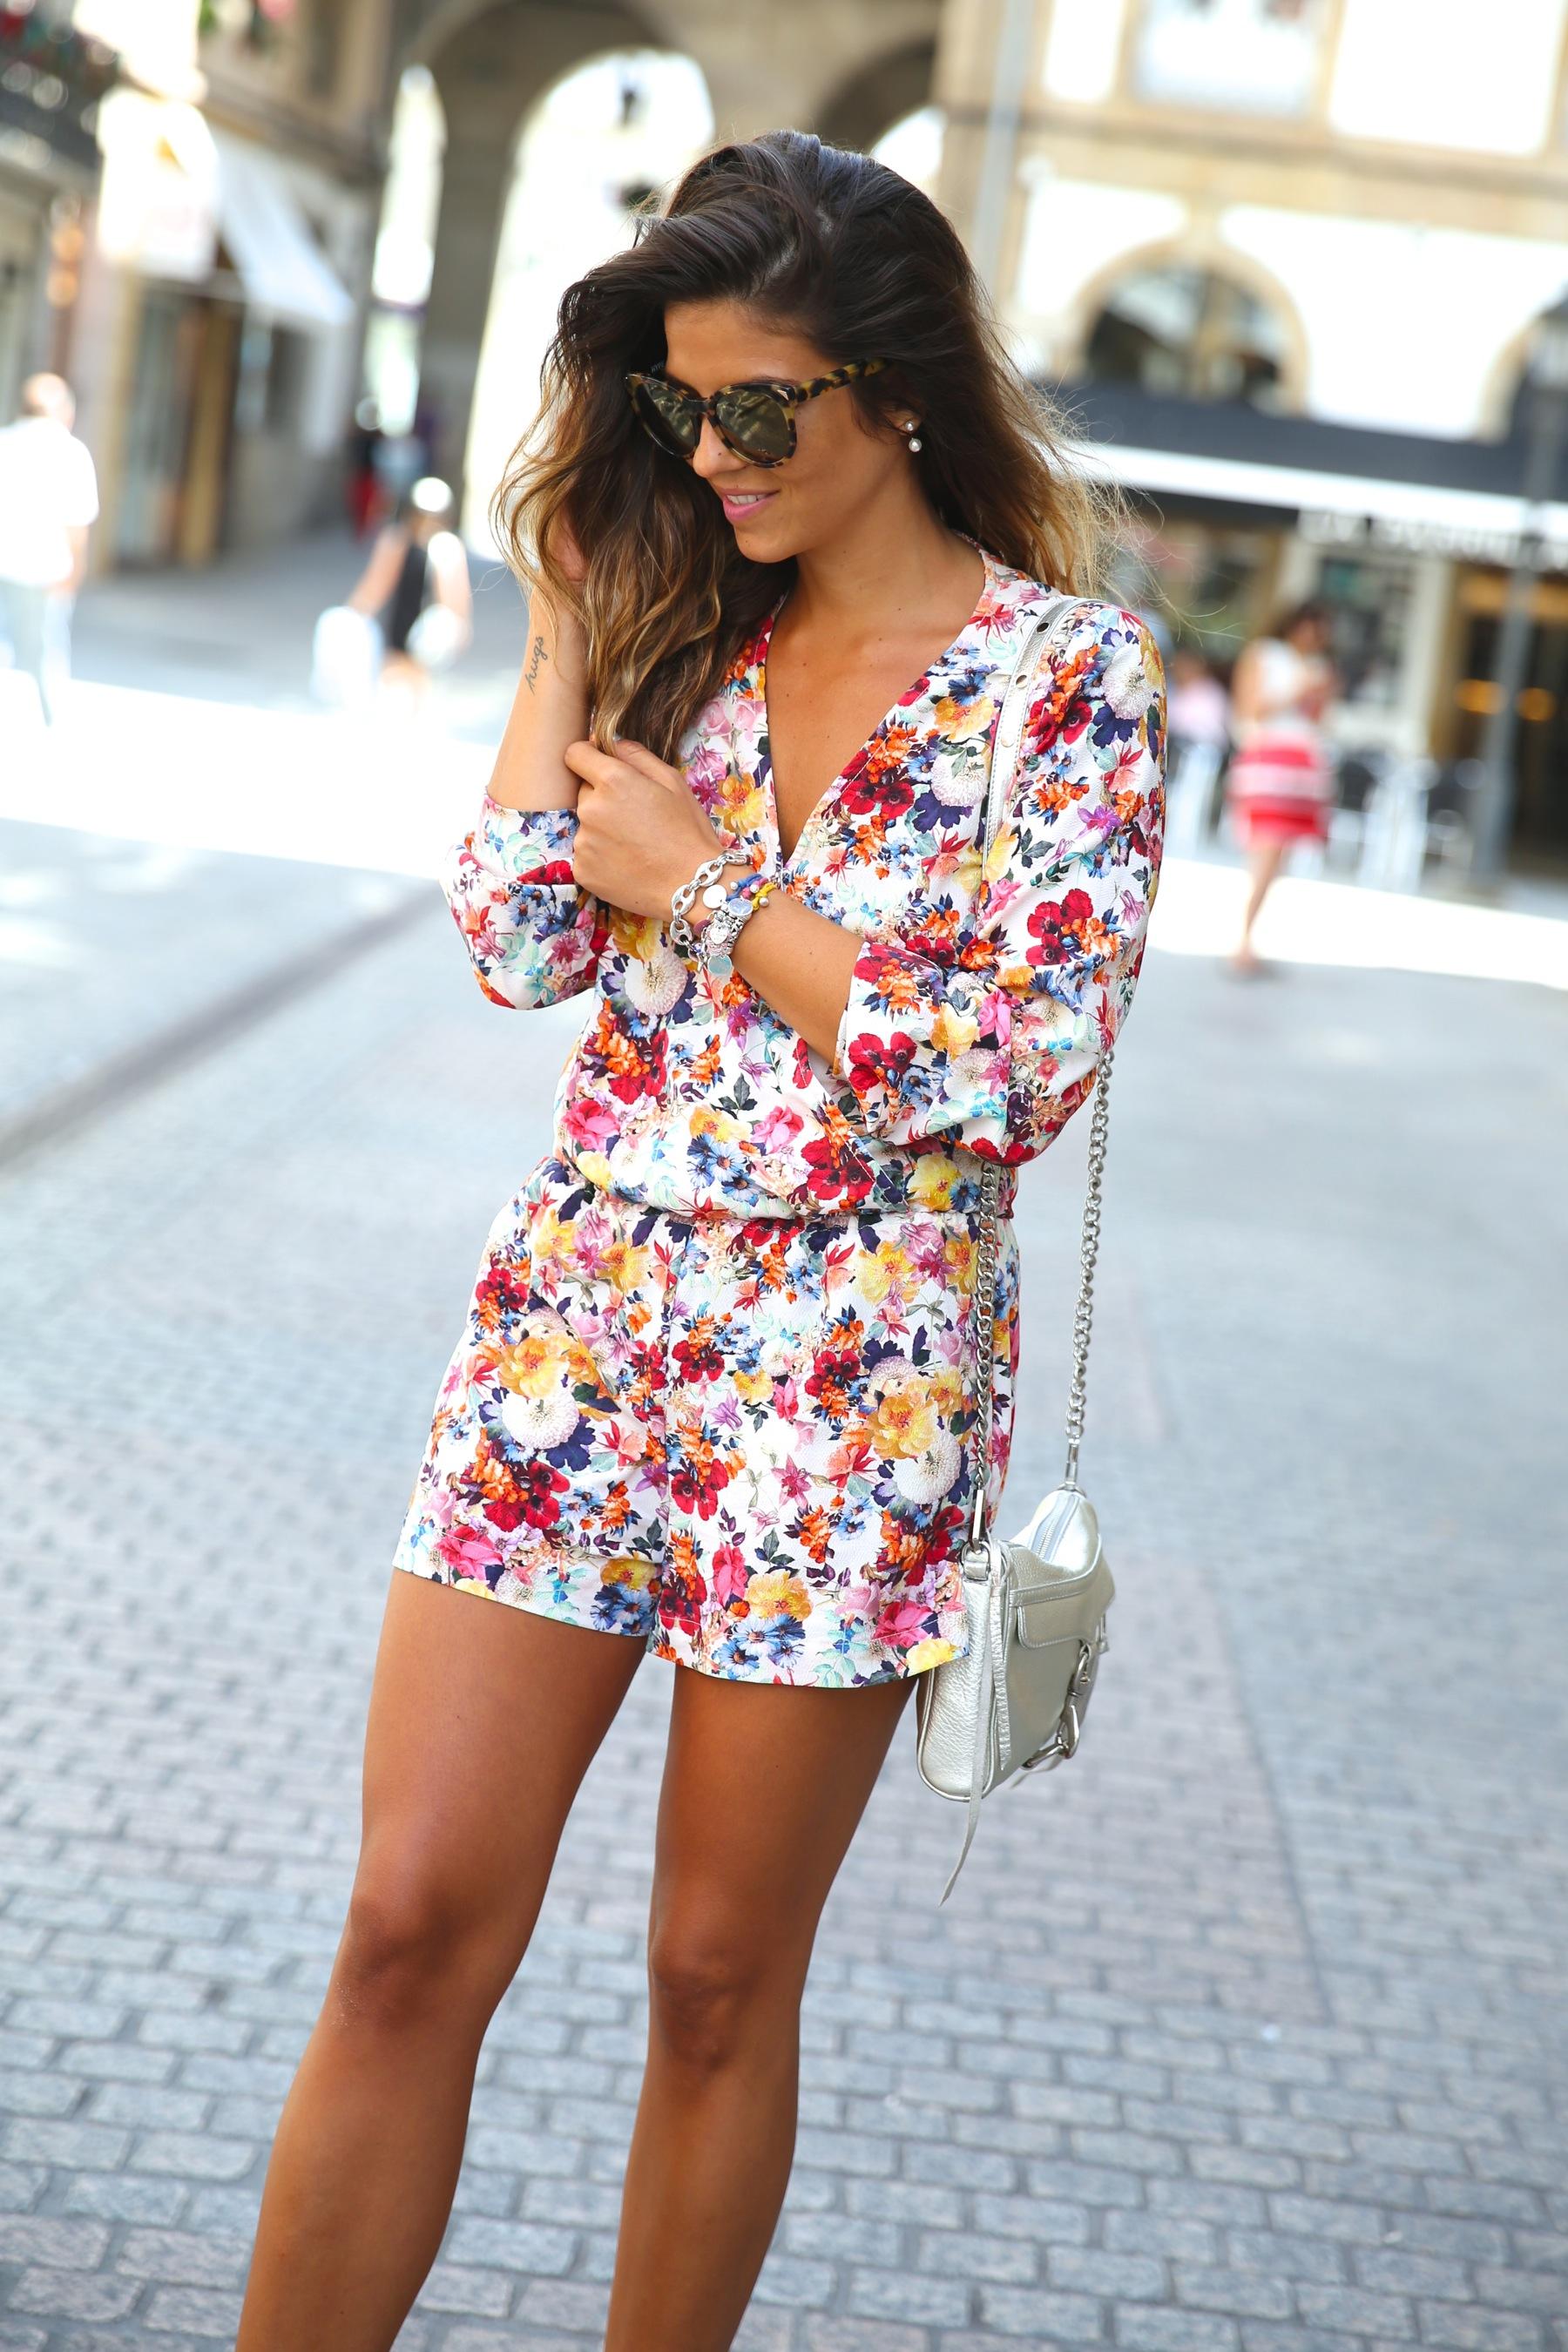 trendy_taste-look-outfit-street_style-ootd-blog-blogger-fashion_spain-moda_españa-mono-flores-flower_print-verano-summer-overall-la_coruña-5